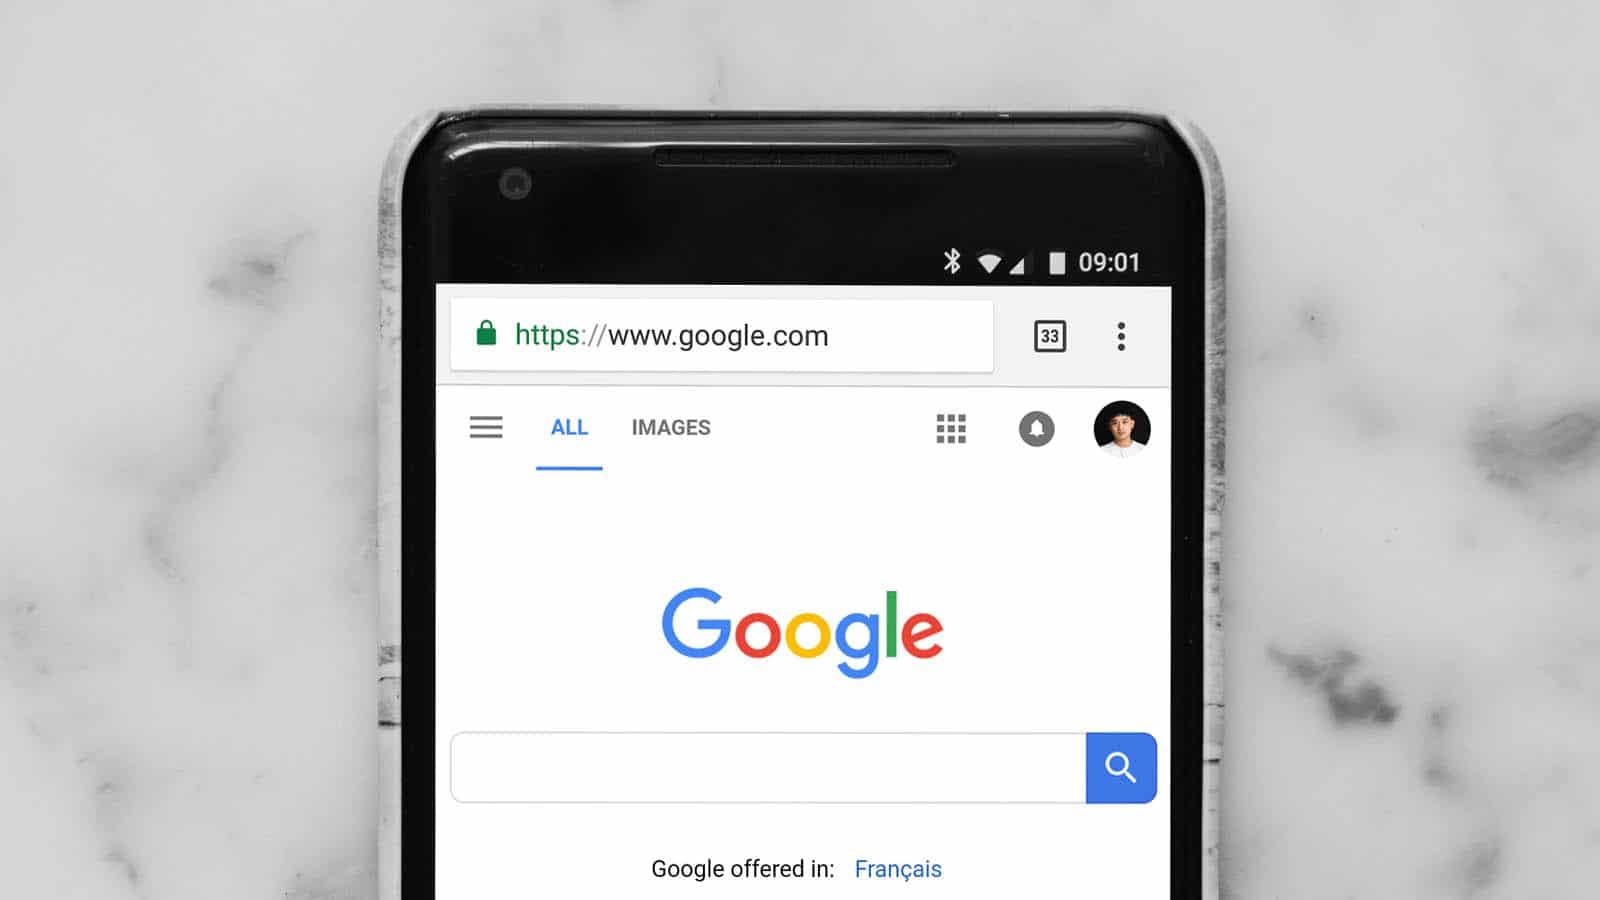 google app on smartphone